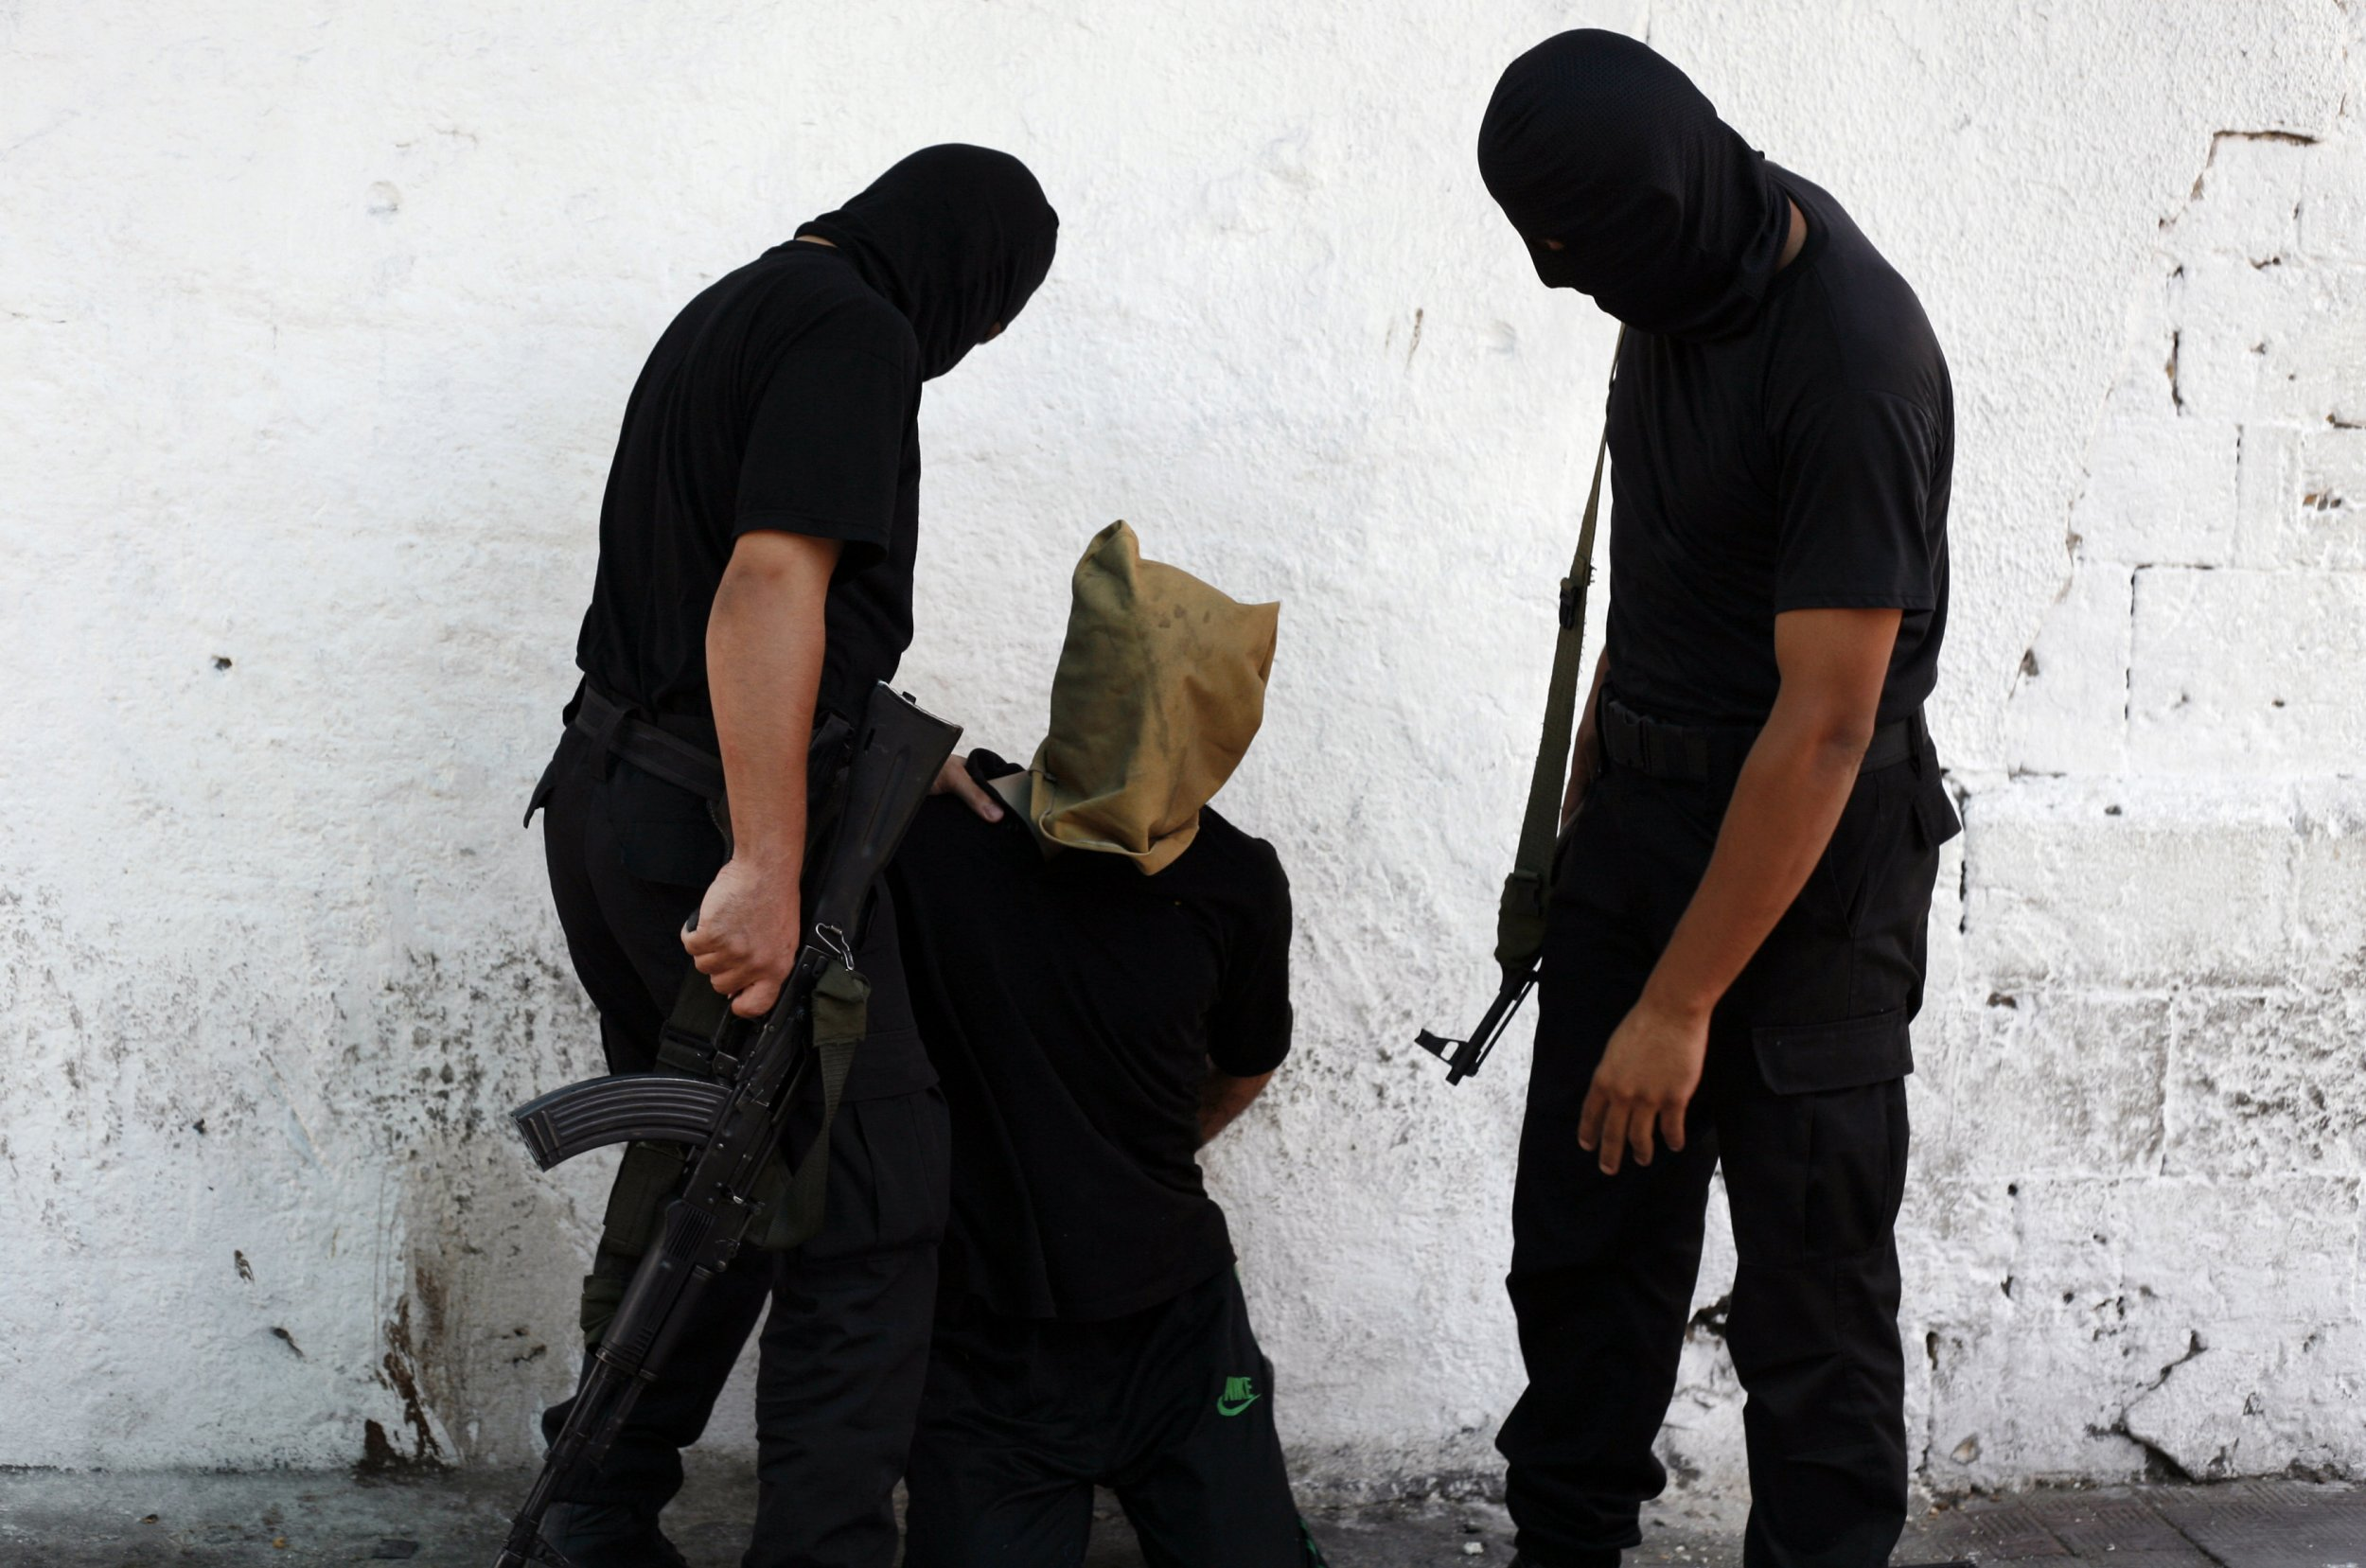 Hamas militants before execution